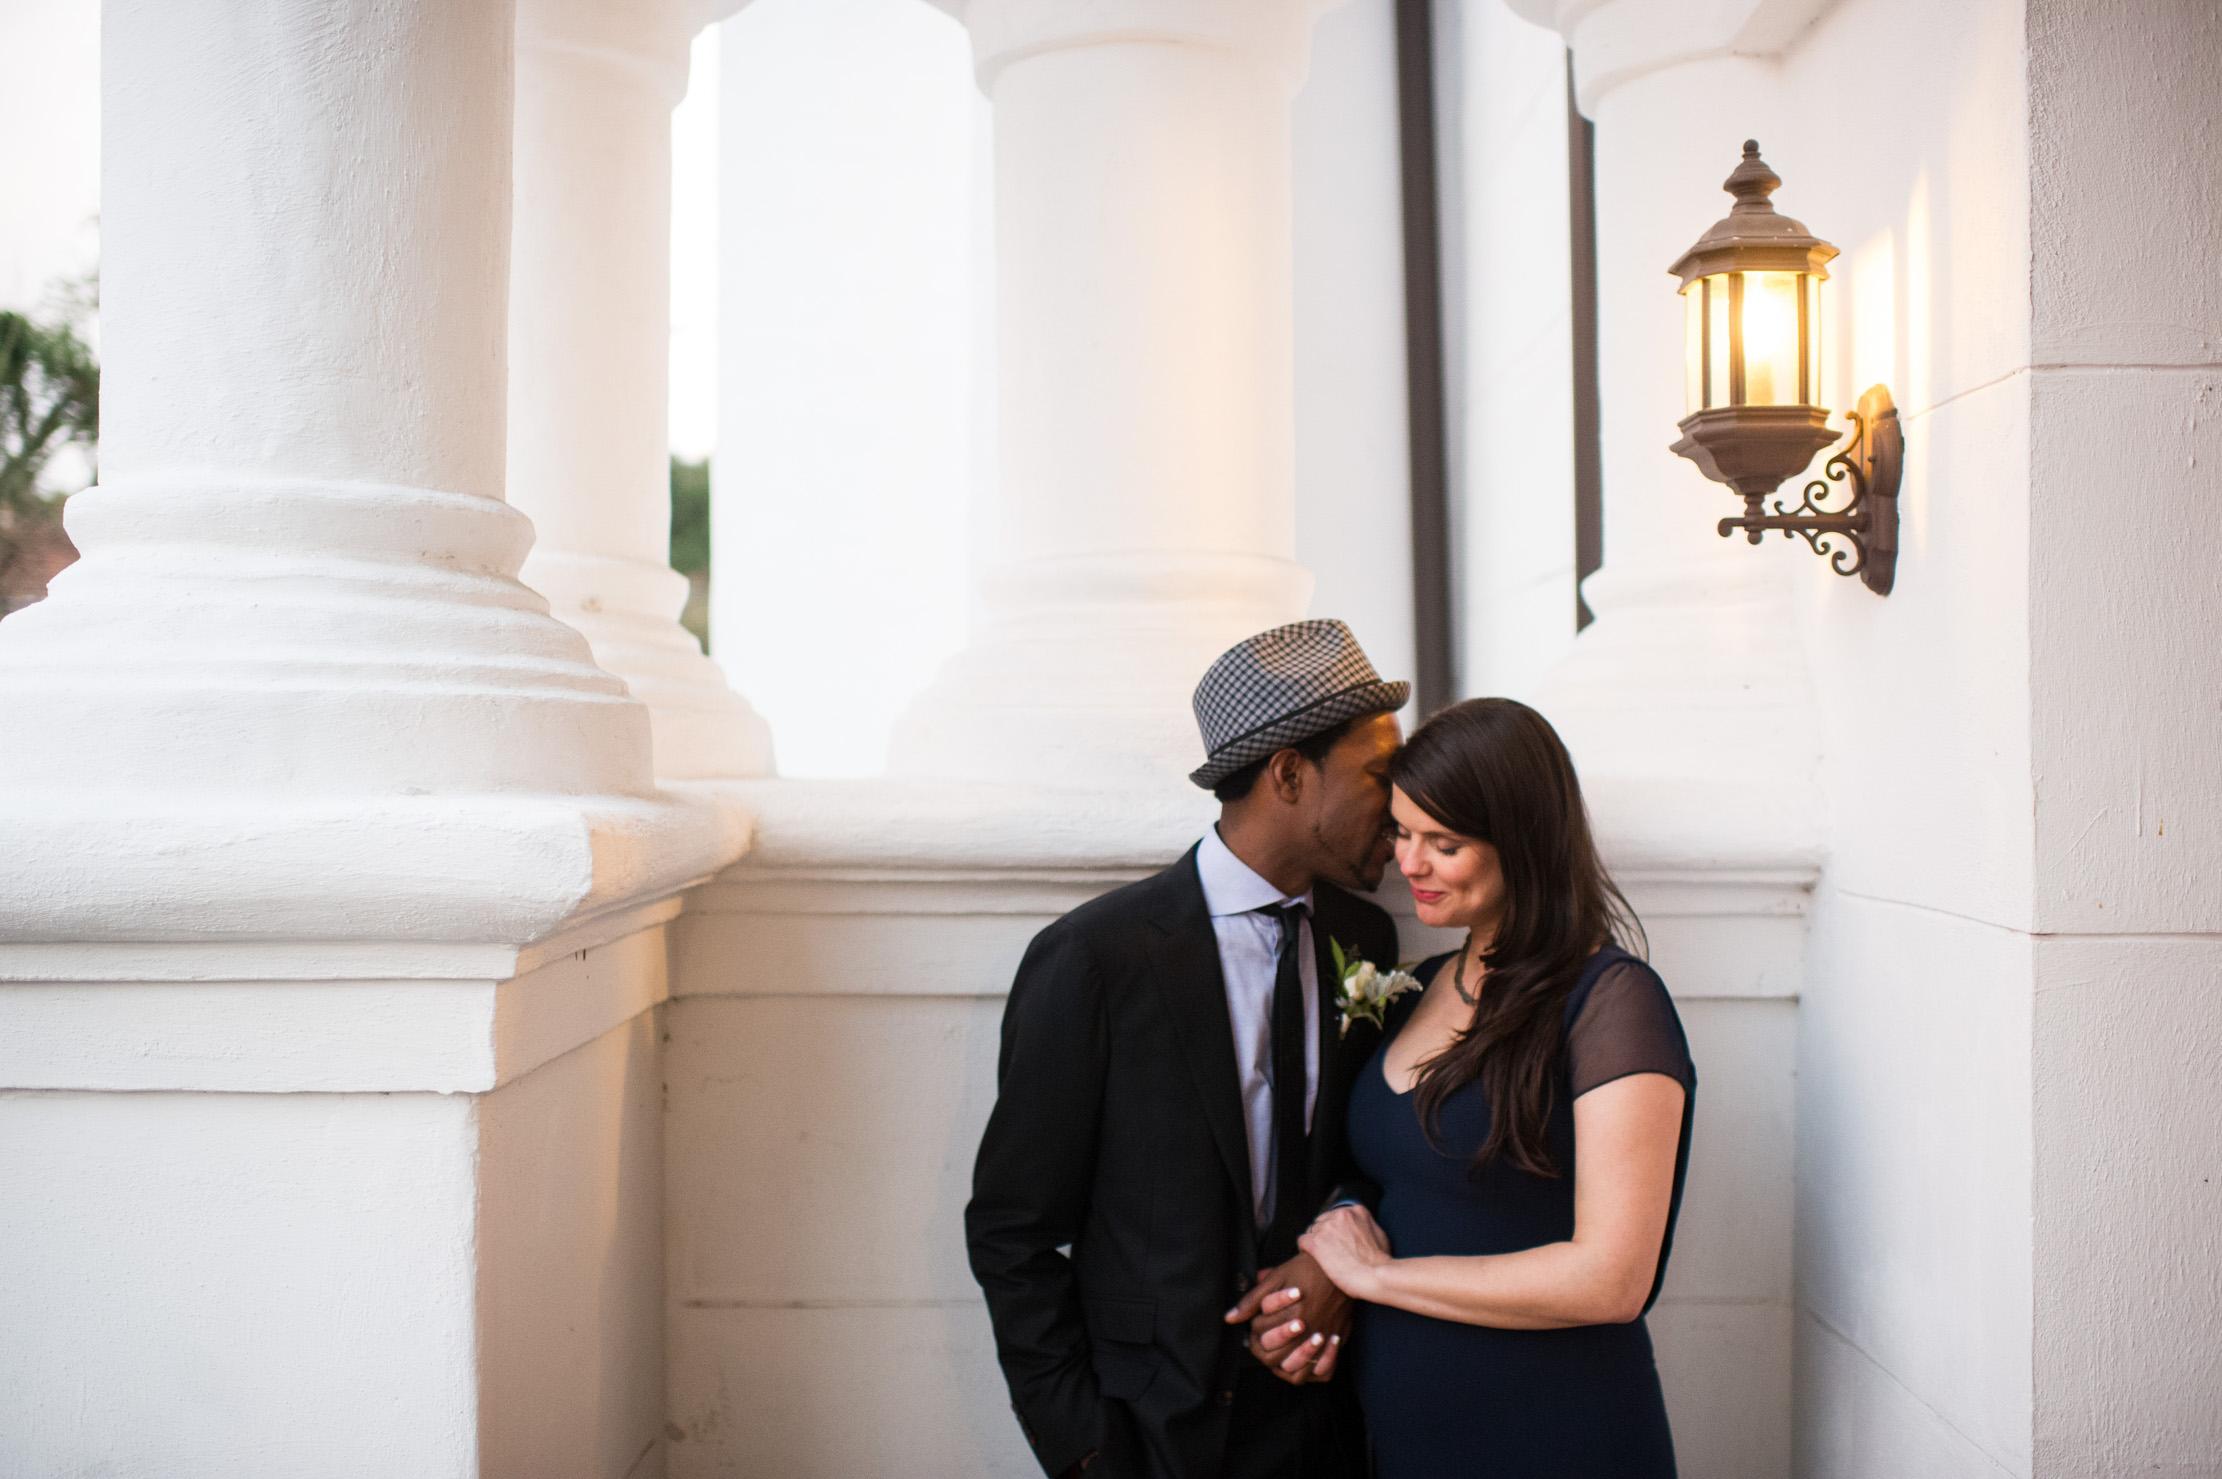 NOLA-Felicity-Church-Ace-Hotel-Wedding-1094.jpg